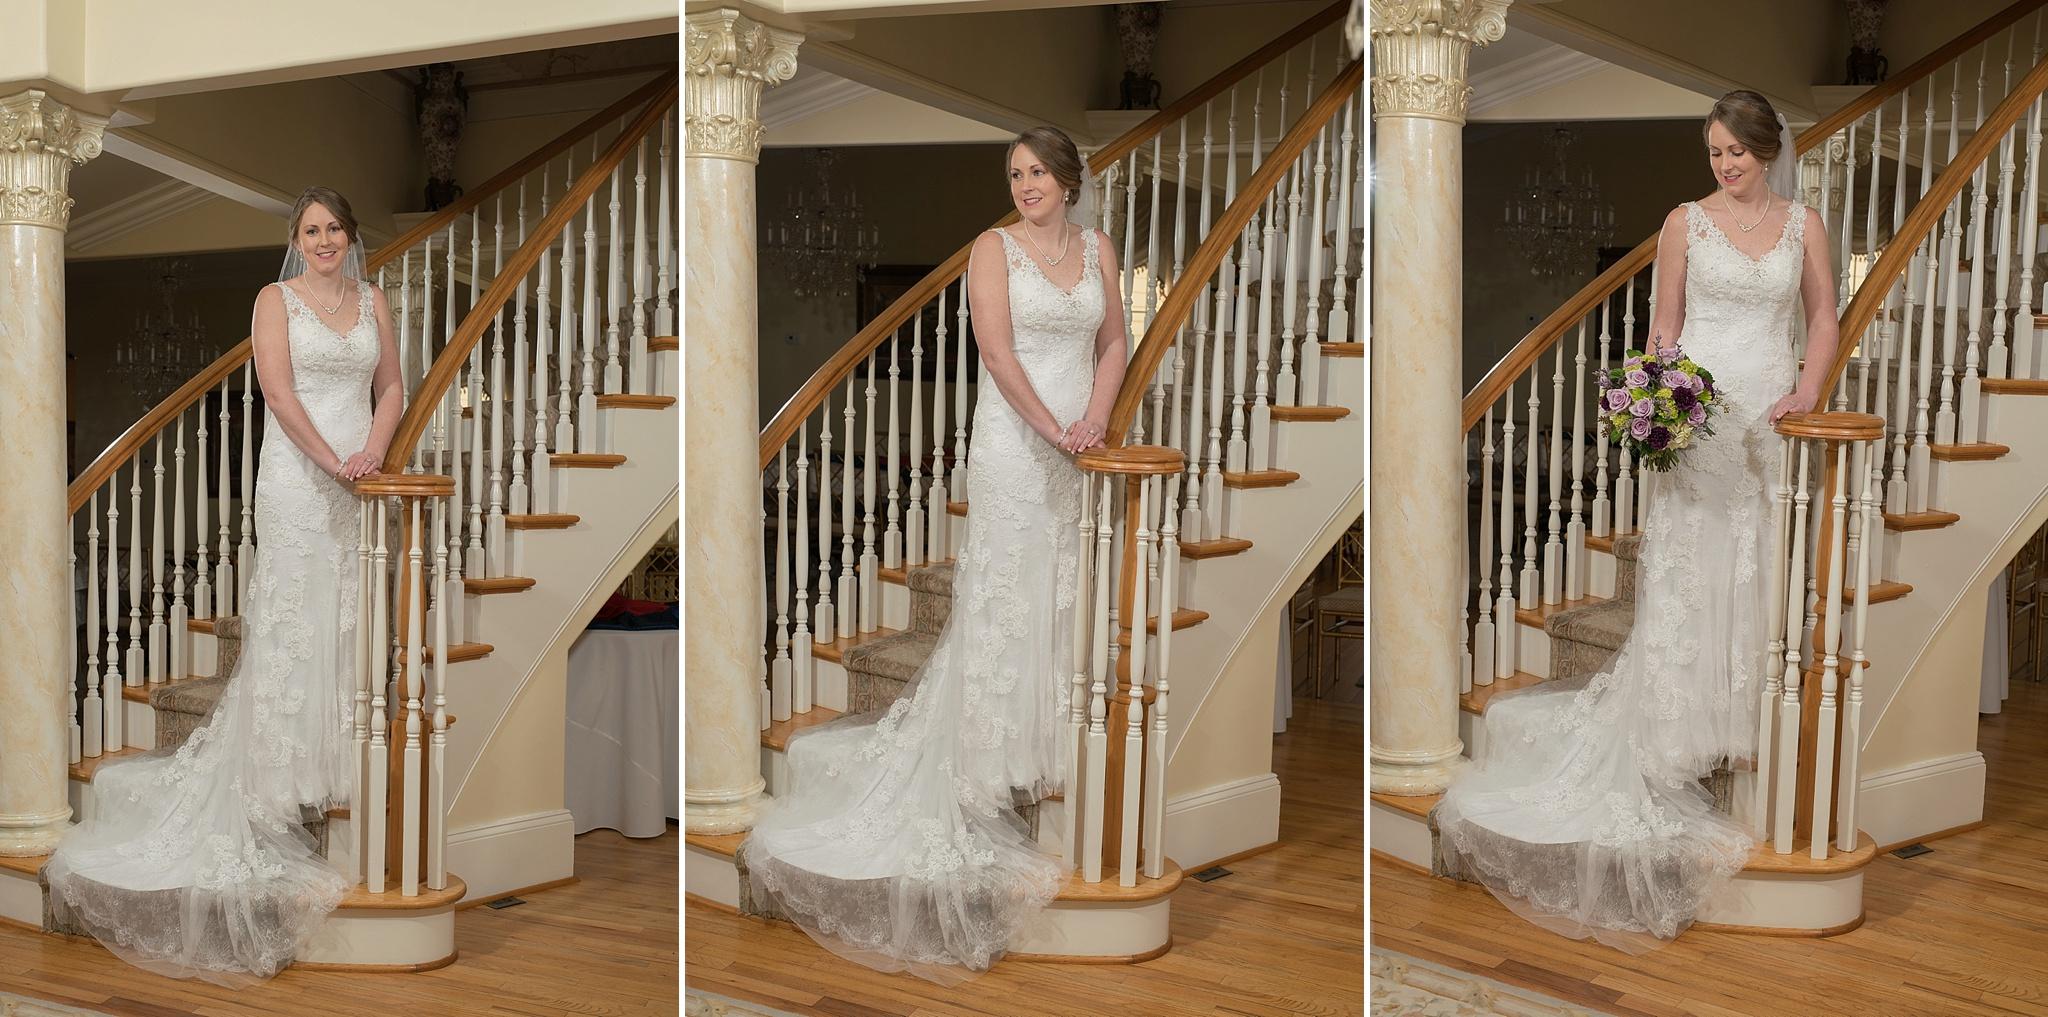 Yankee-Hall-Plantation-Wedding-NC-Photographer-0141.jpg